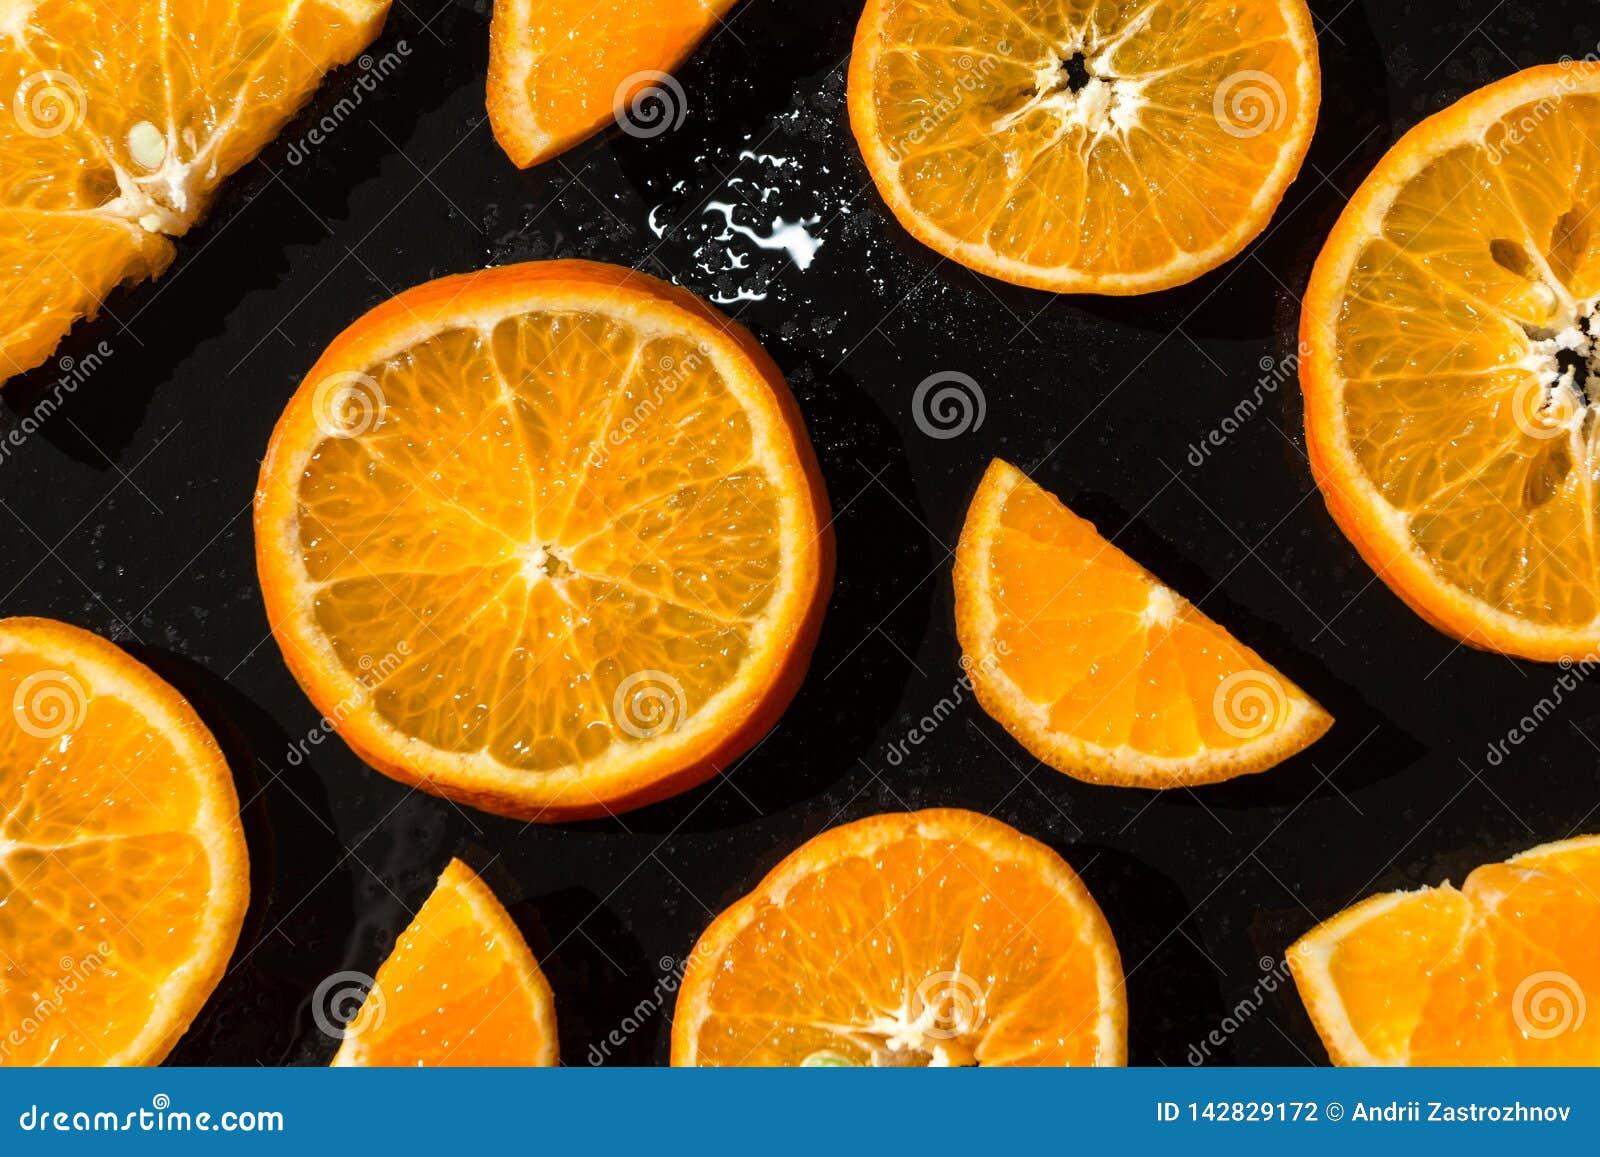 Juicy tangerines, sliced on a black background